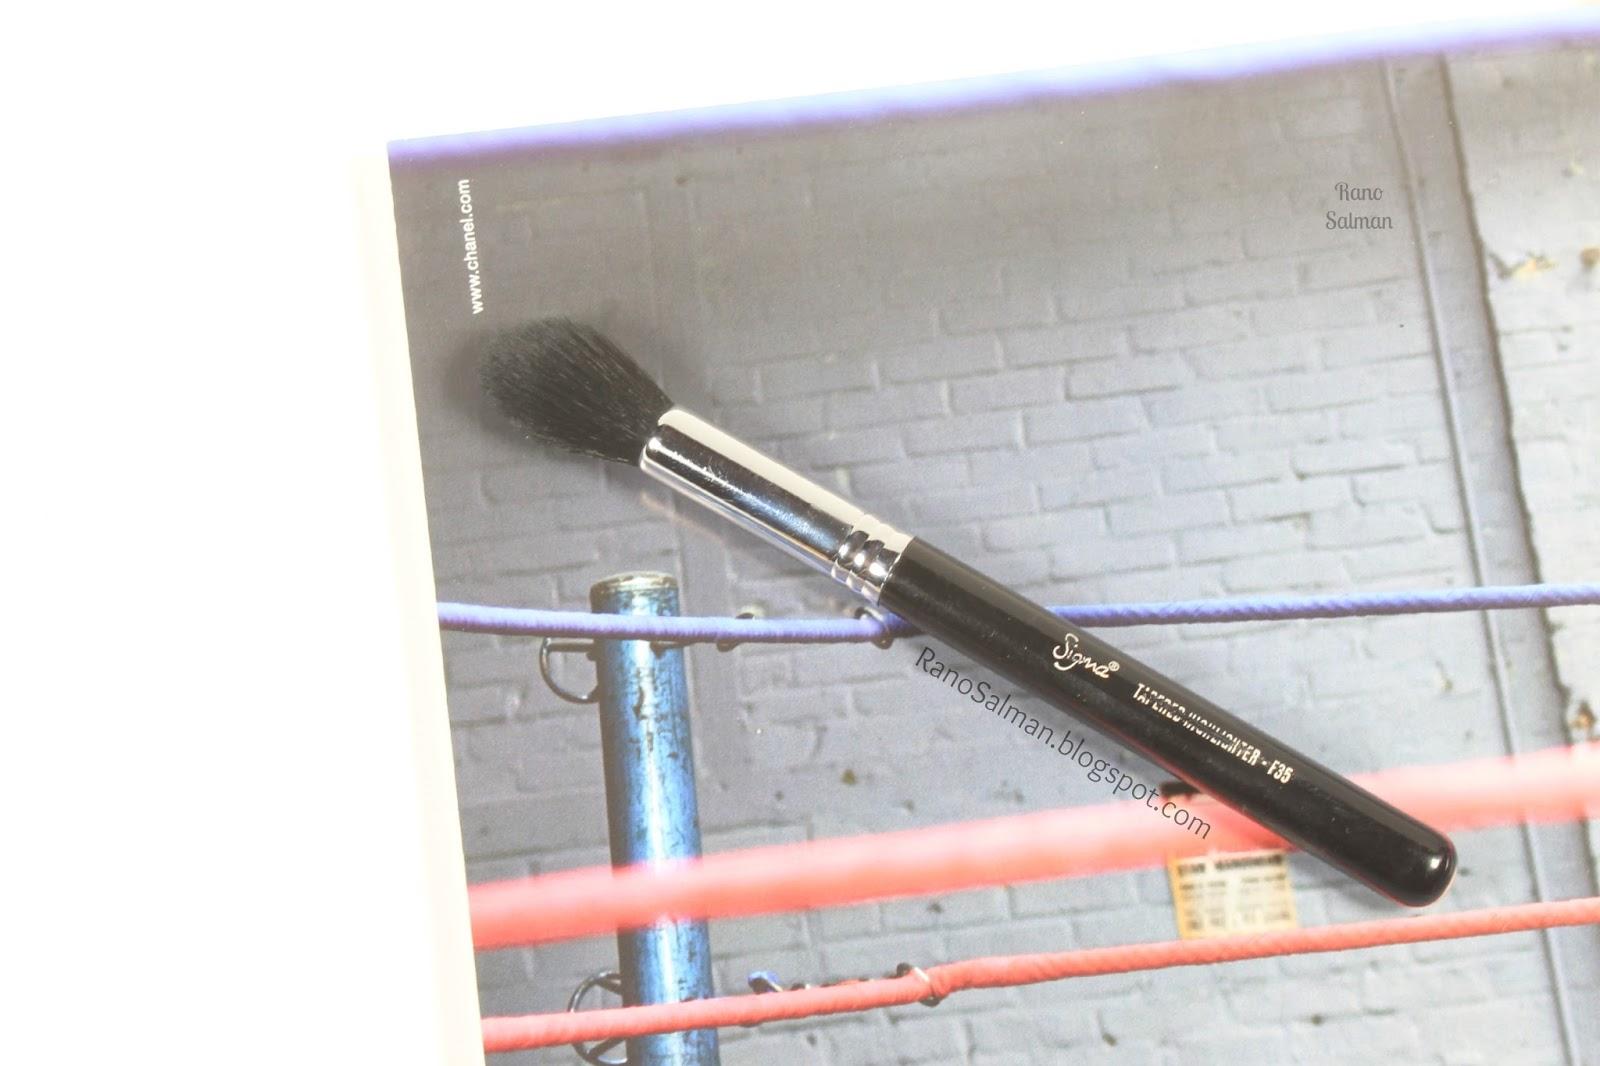 d9871ba7bd44e My Sigma Brushes - Face Brushes فرش سيقما - فرش الوجة - Rano Salman